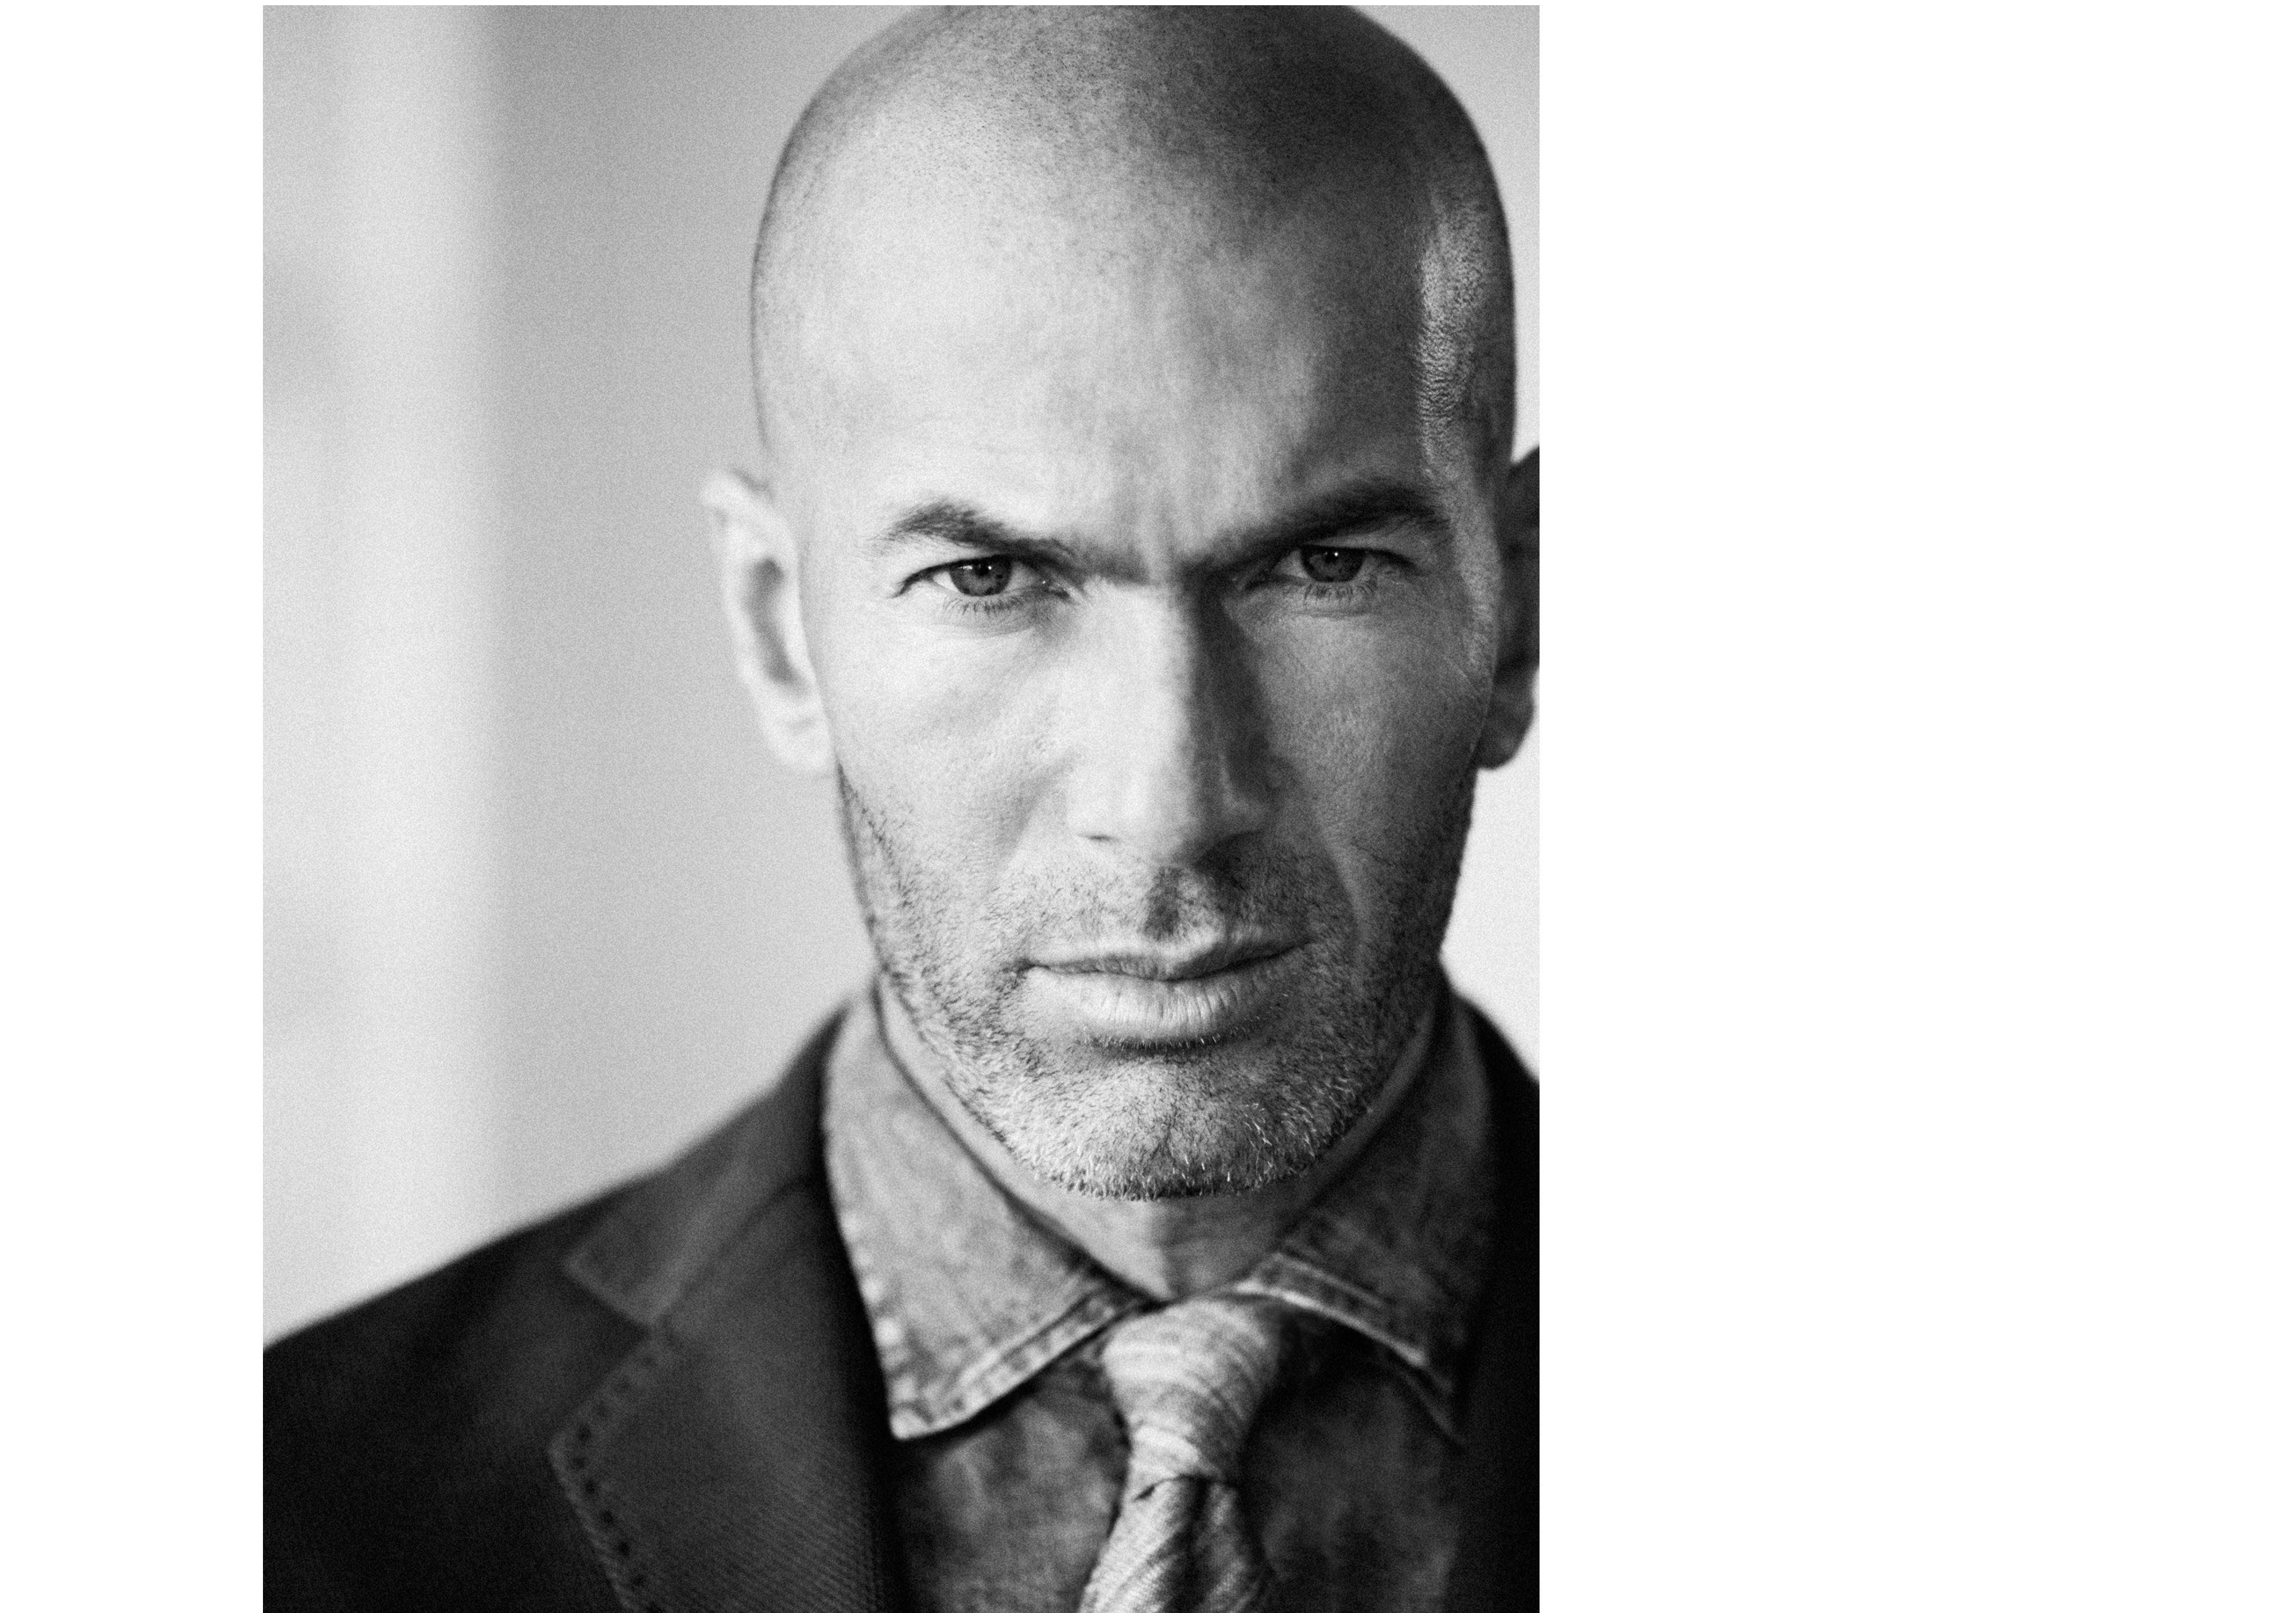 Zinedine Zidane voor Mango - Daily Cappuccino - Lifestyle Blog